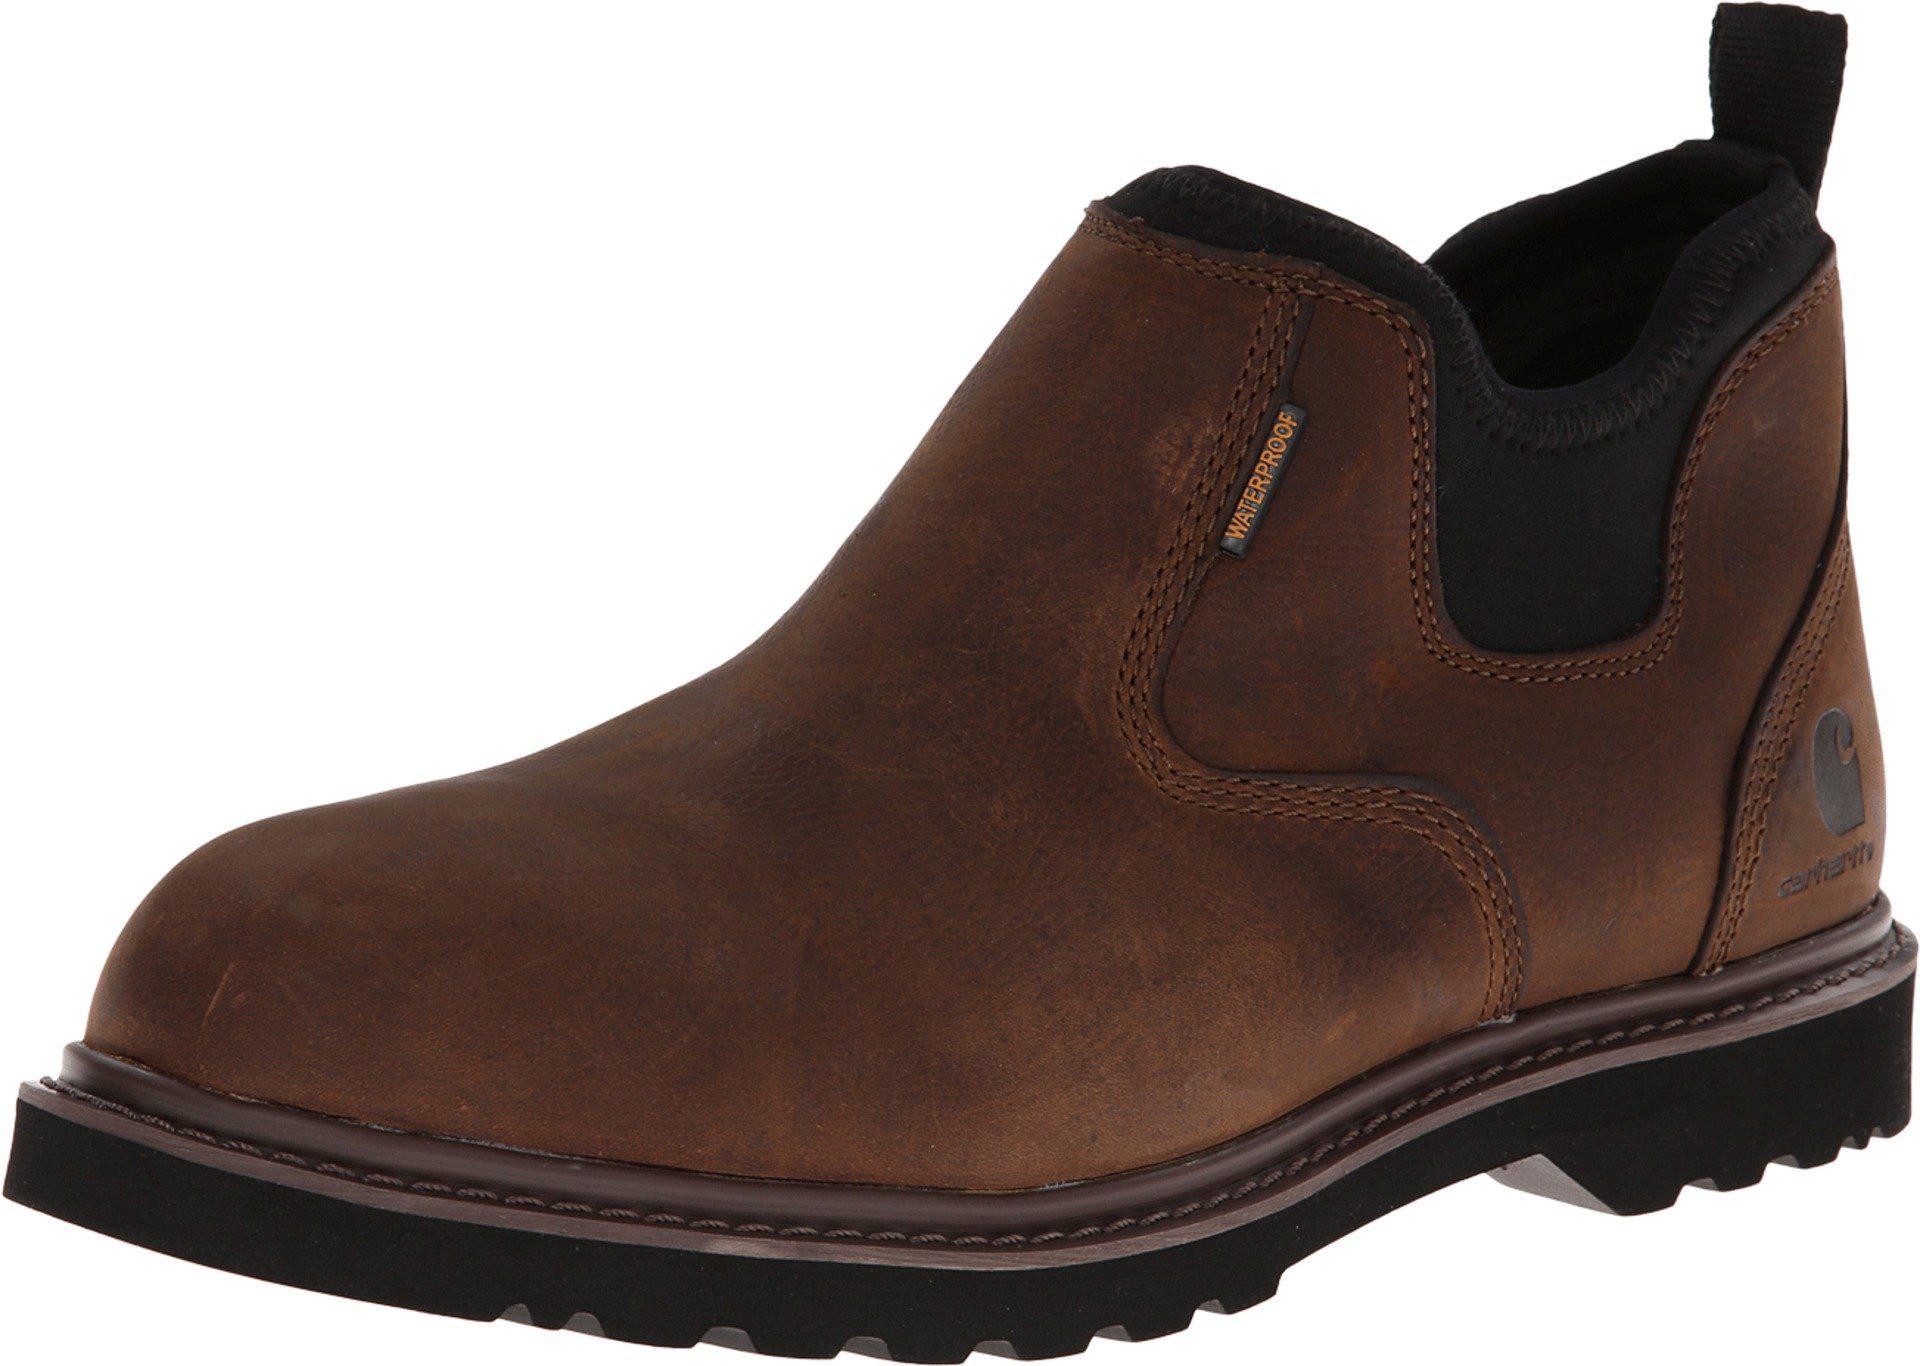 86032e2d1a6 Men's Brown Waterproof Oxford Romeo